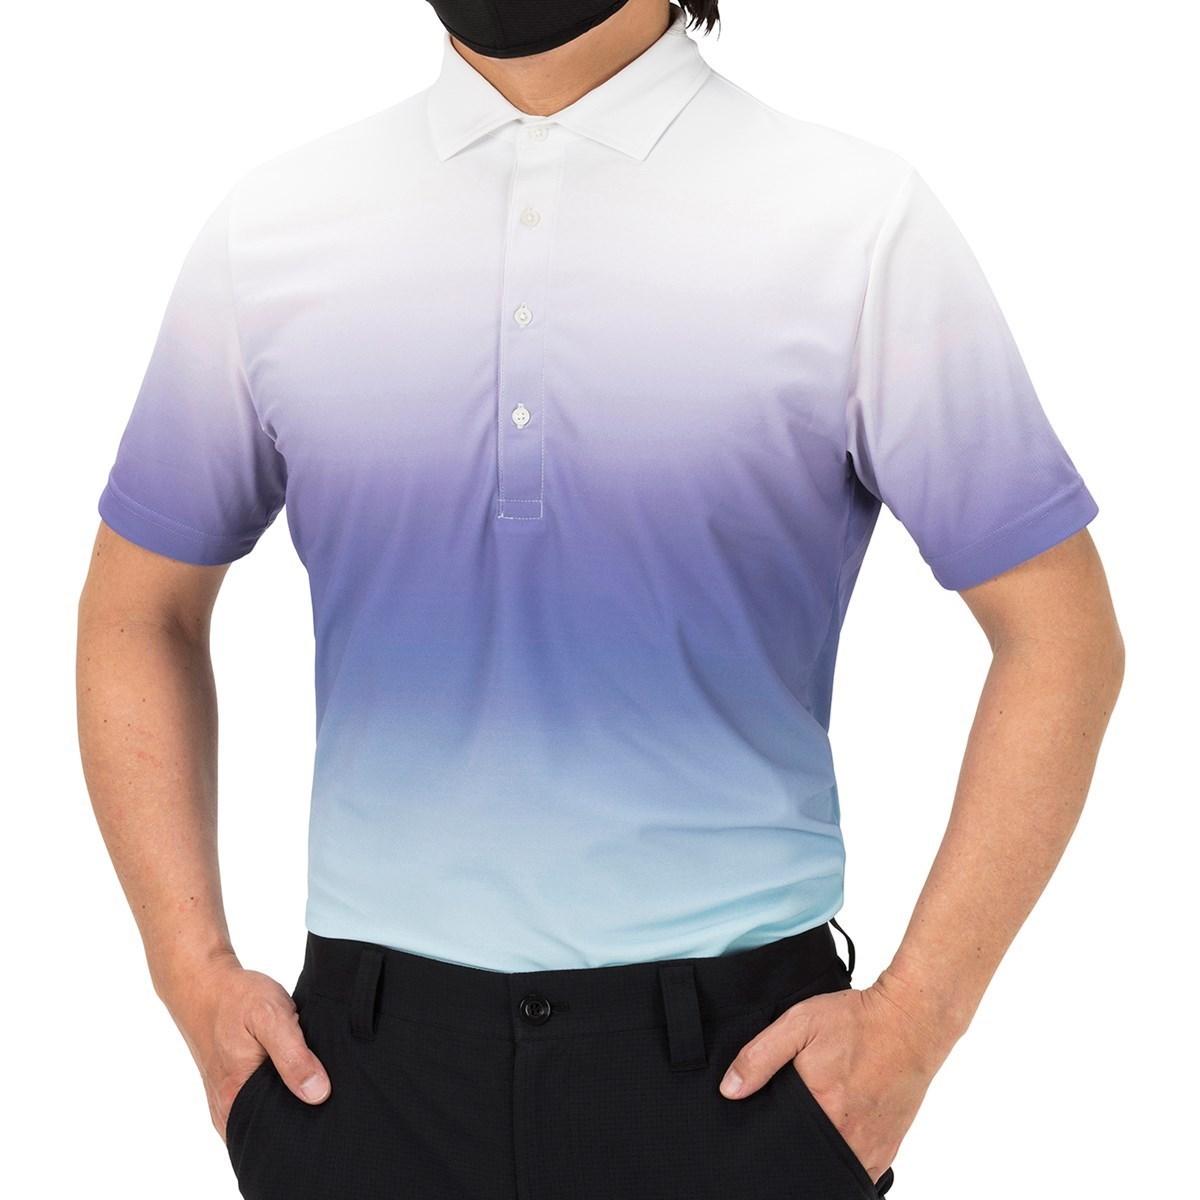 GDO オリジナル 半袖ゴルフシャツ